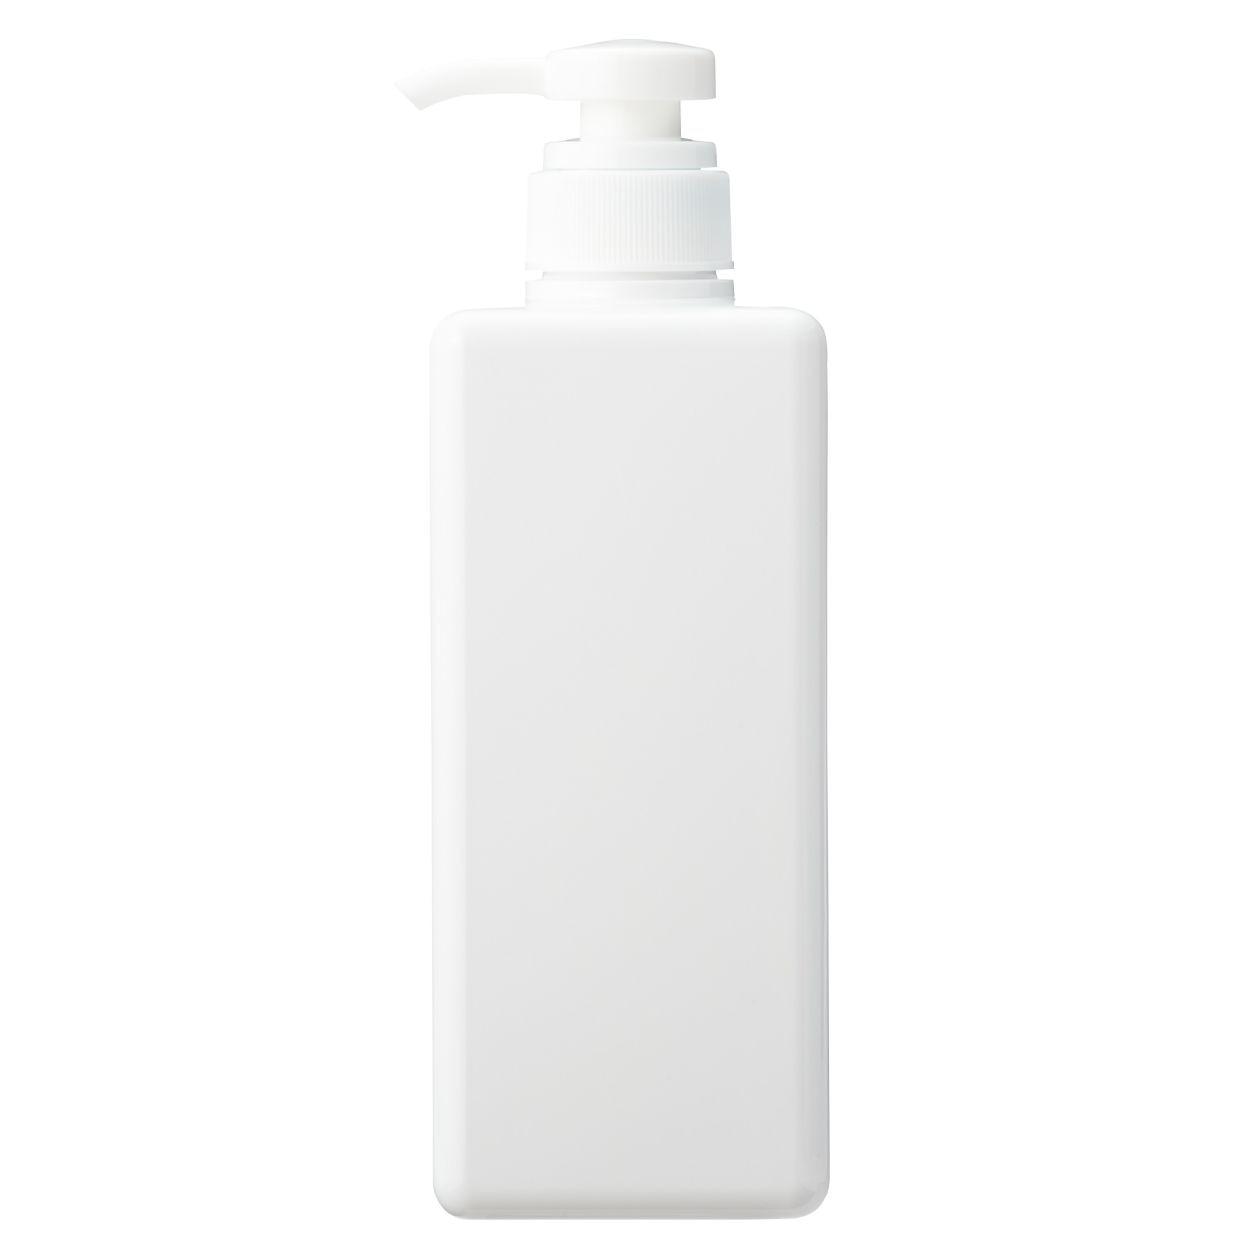 PET詰替ボトル・ホワイト ホワイトの写真